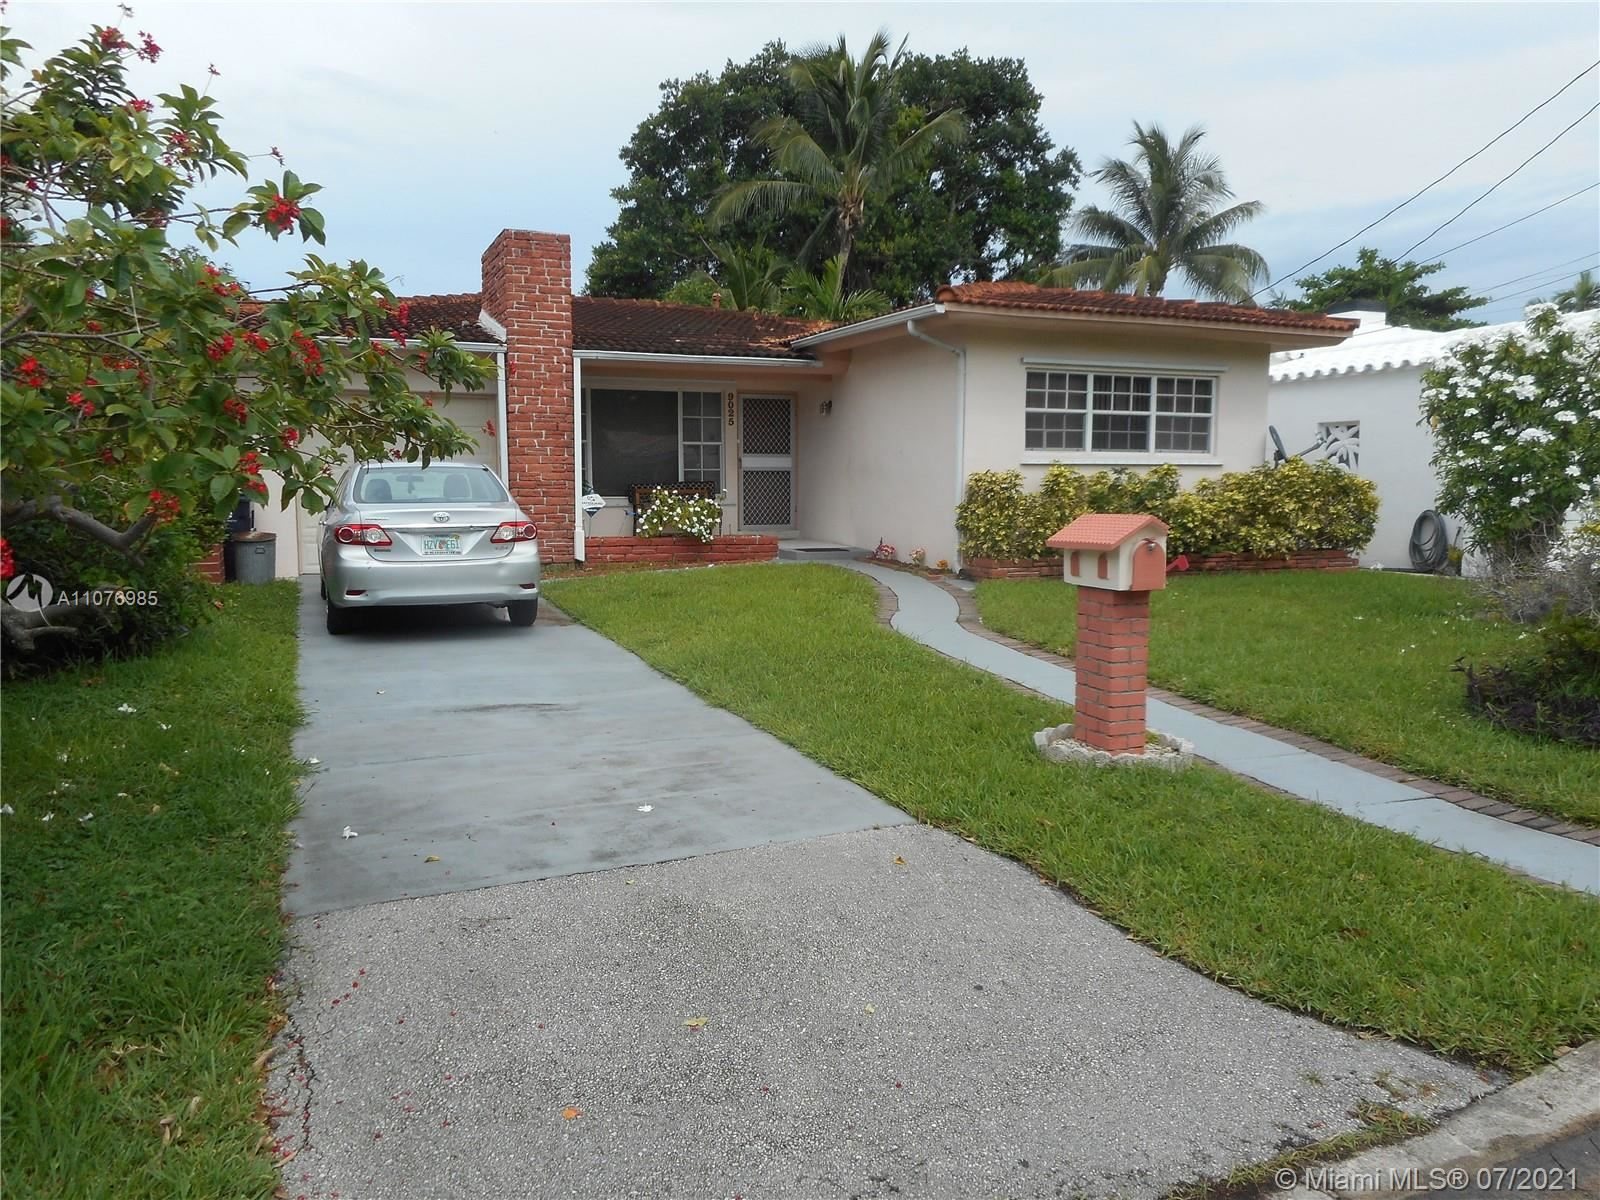 9025 Hawthorne Ave, Surfside, FL 33154 - #: A11076985